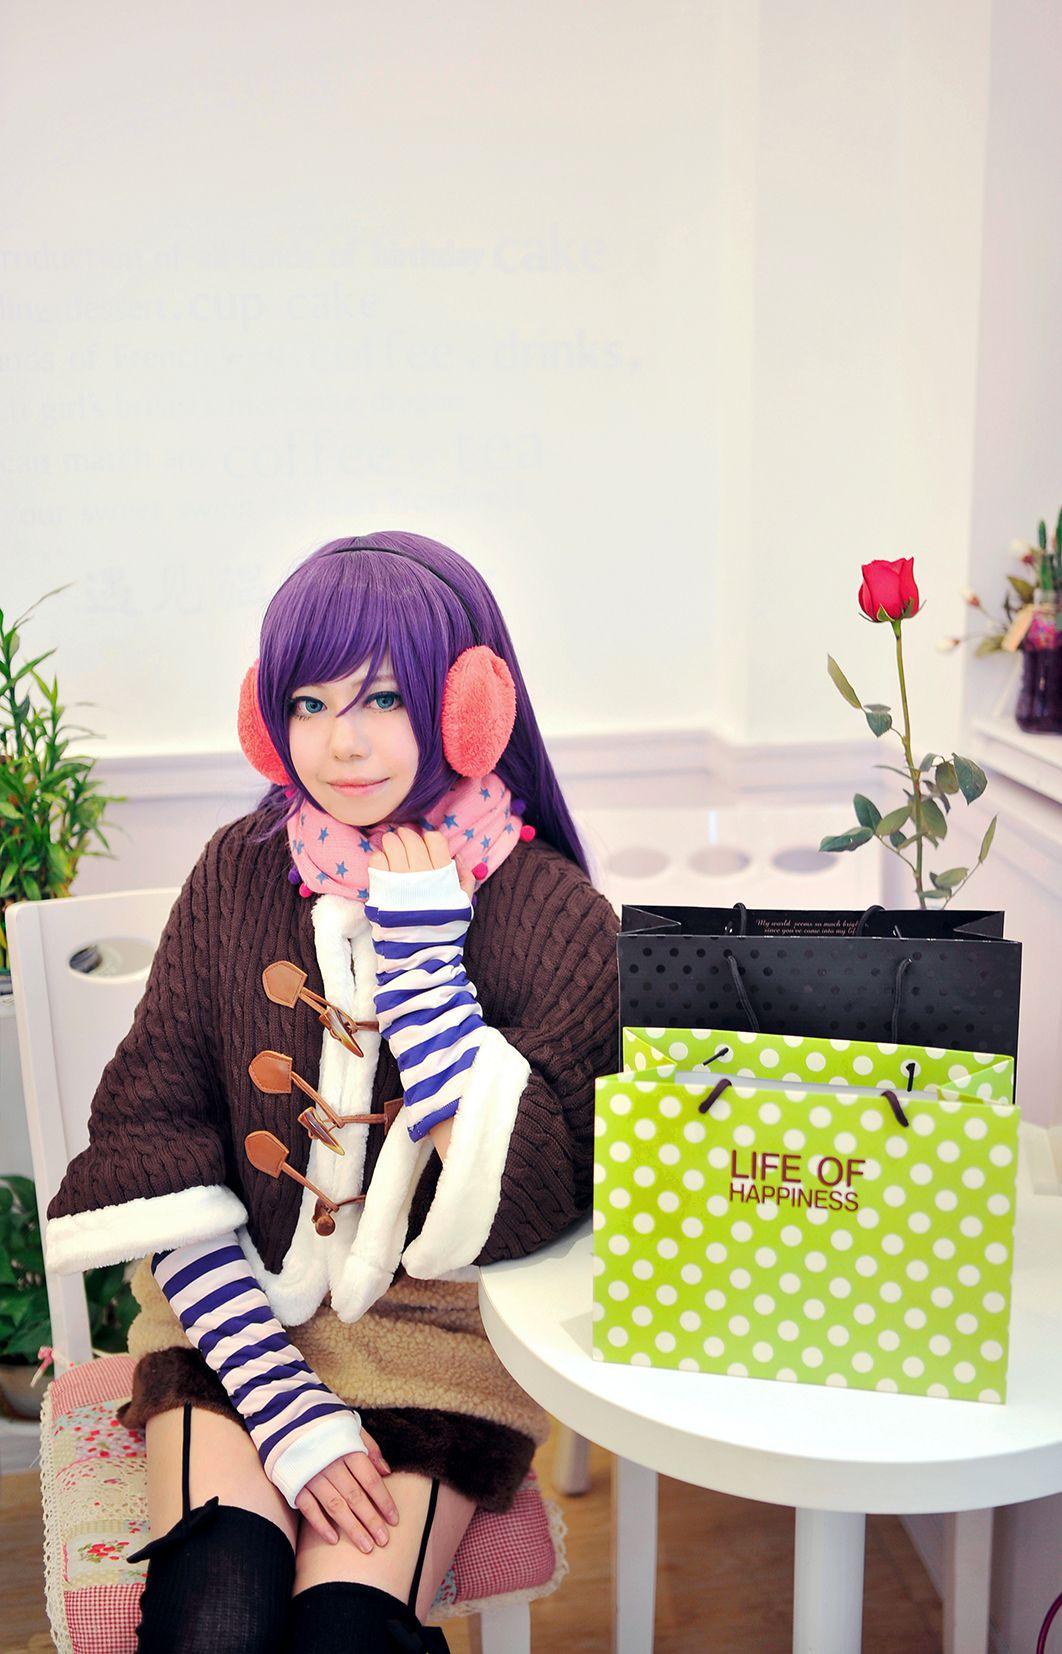 [CosPlay] lovelive!圣诞未觉醒冬装 西木野真姬东条希丝袜美图初公开 [25P]